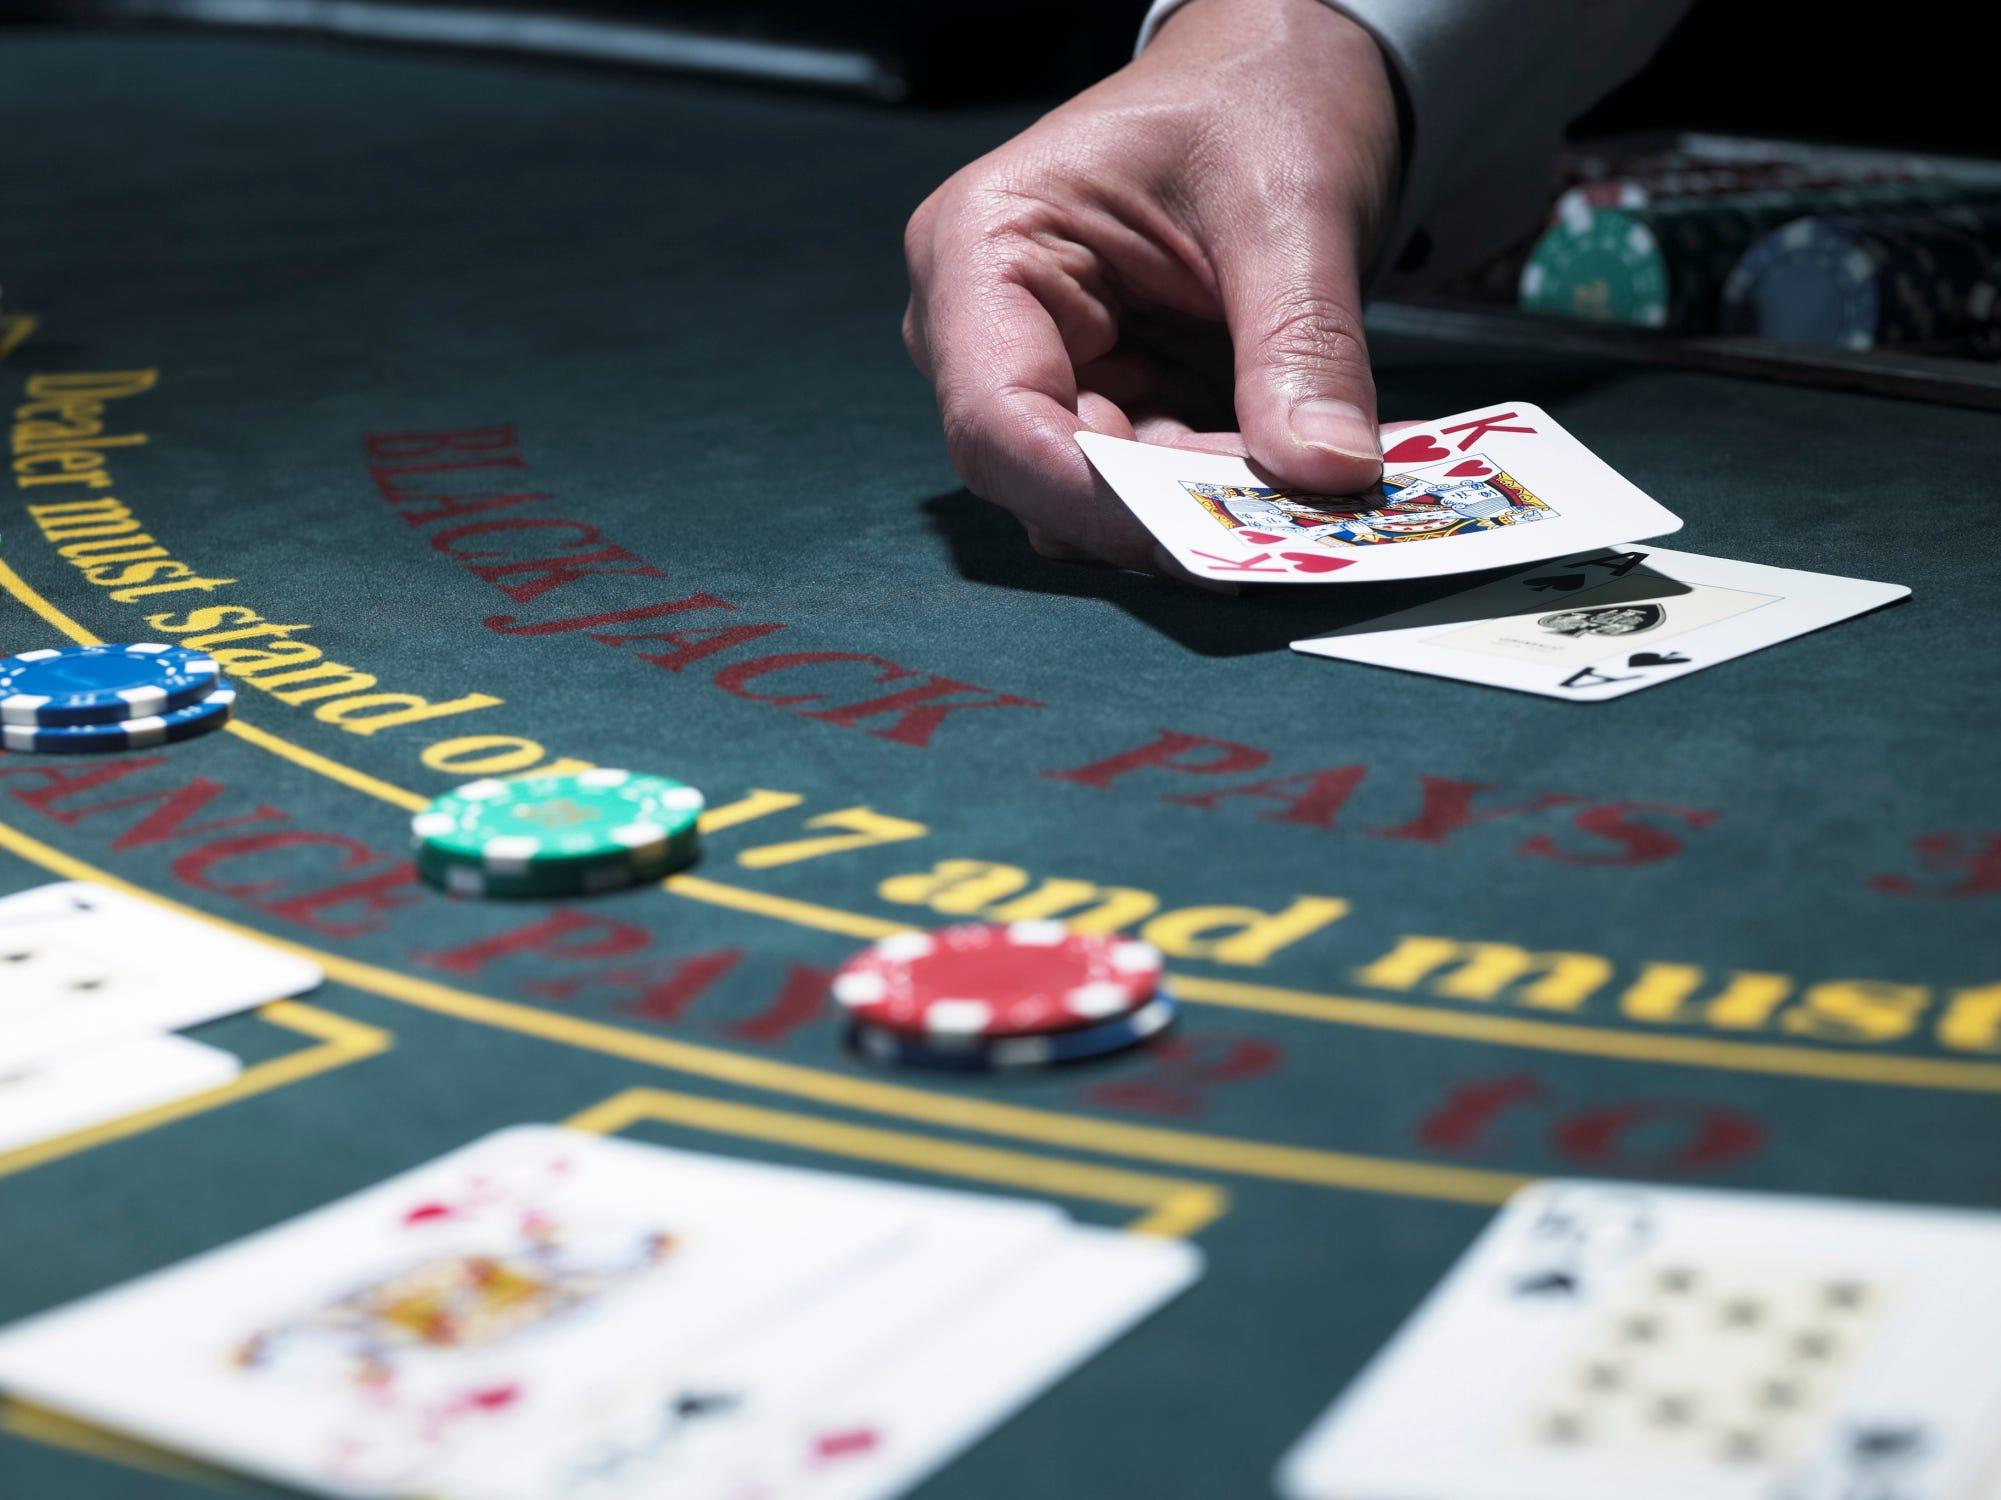 Articles on compulsive gambling gambling addiction recovery statistics